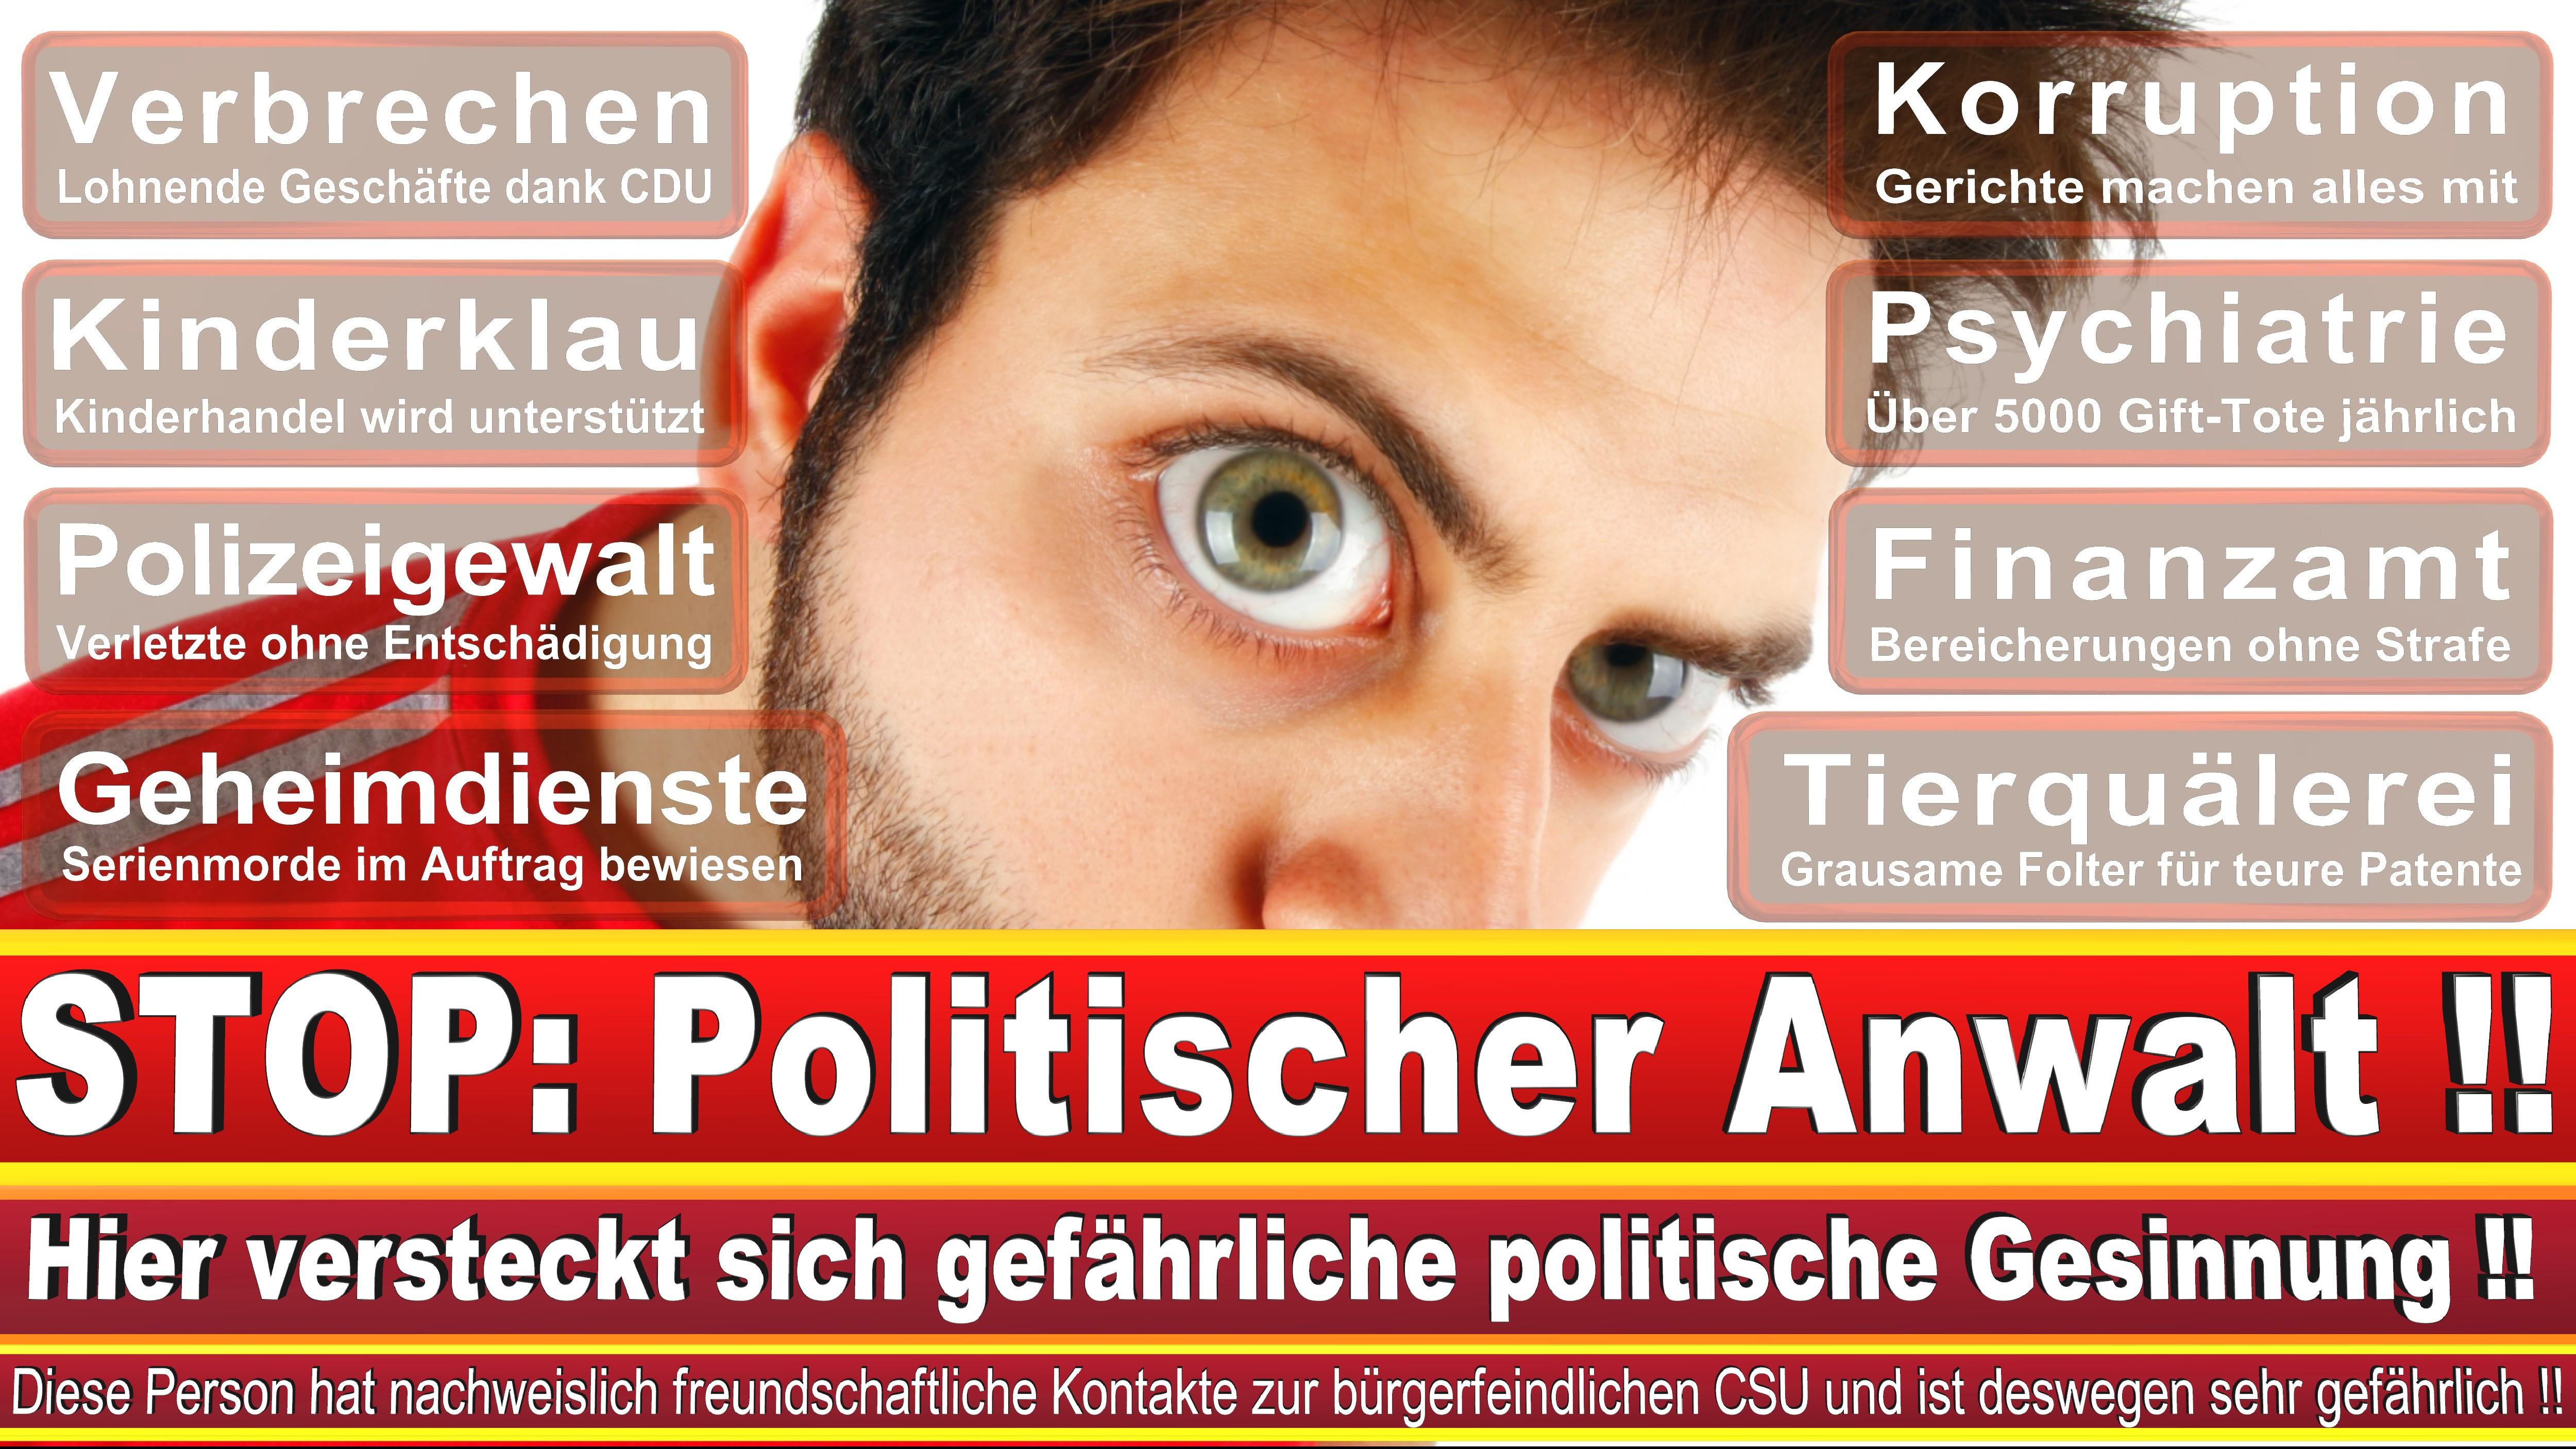 Rechtsanwalt Markus Ihle Inhaber Passau Rechtsanwaltskanzlei Markus Ihle